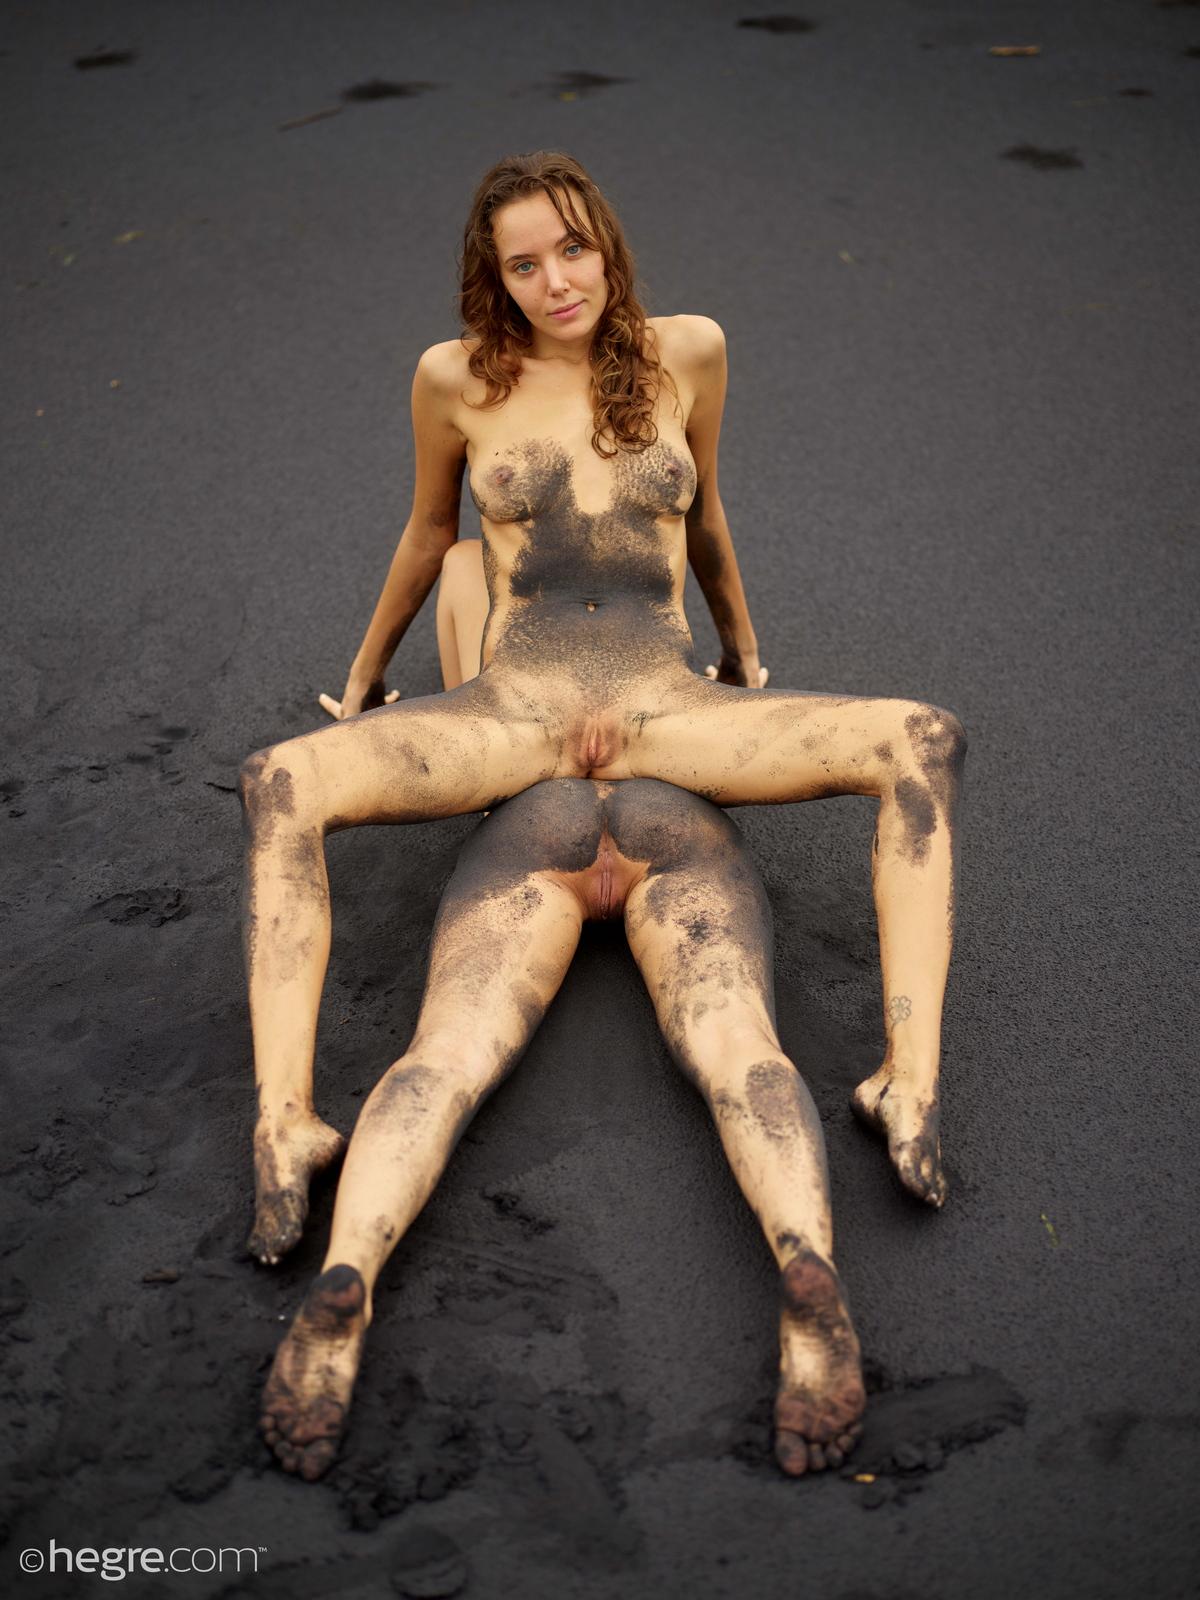 clover-natalia-a-nude-bali-beach-seaside-hegre-30